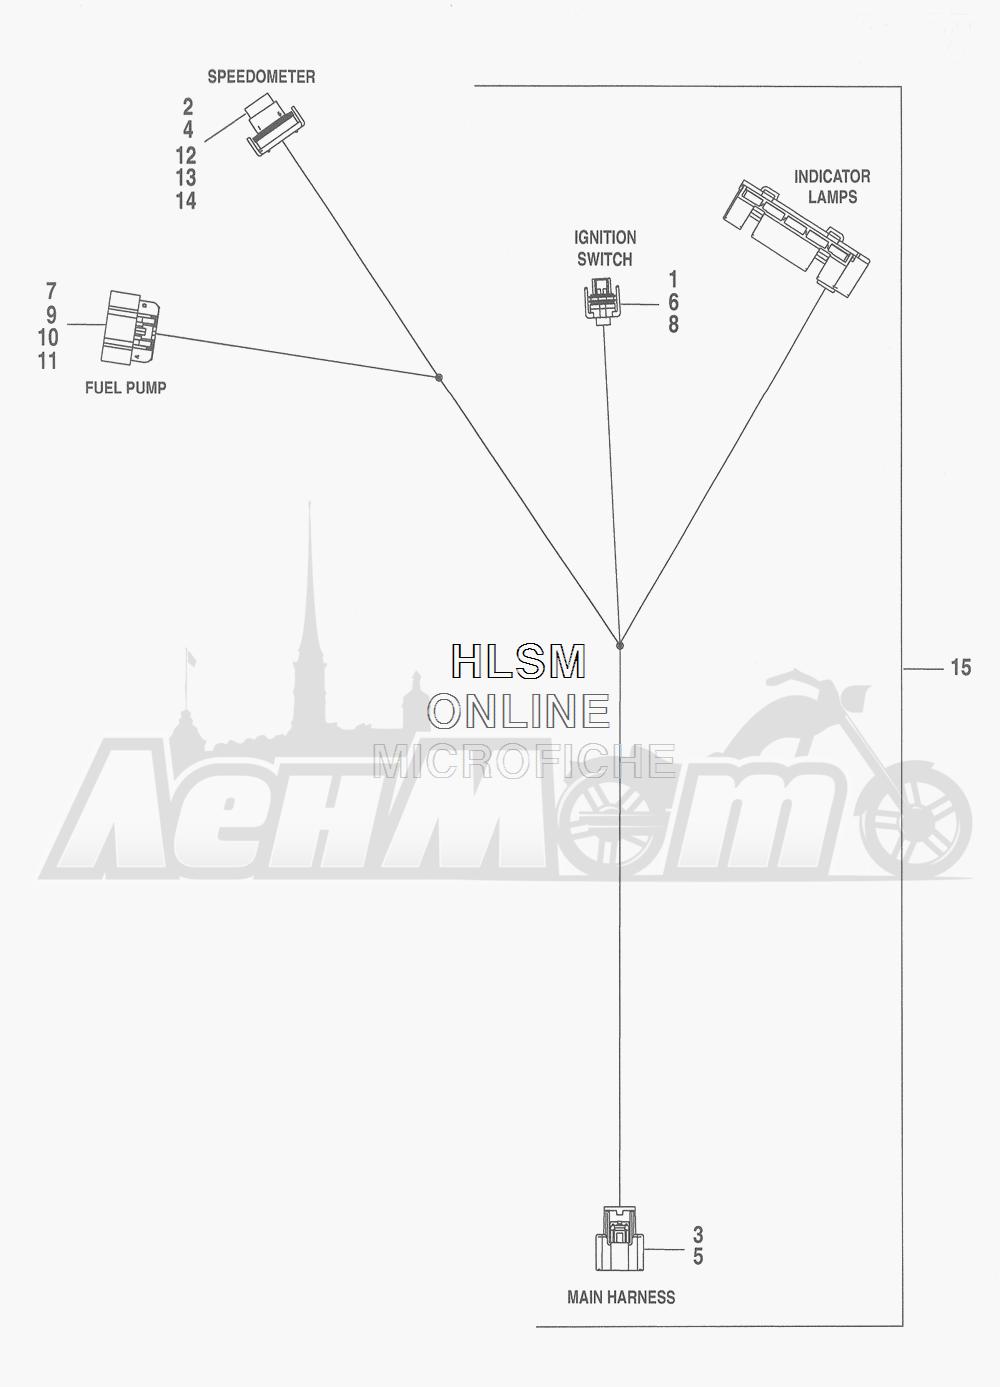 Запчасти для Мотоцикла Harley-Davidson 2016 FLHRC ROAD KING CLASSIC (FRM) Раздел: ELECTRICAL - WIRING HARNESS - CONSOLE | электрика электропроводка коса консоль